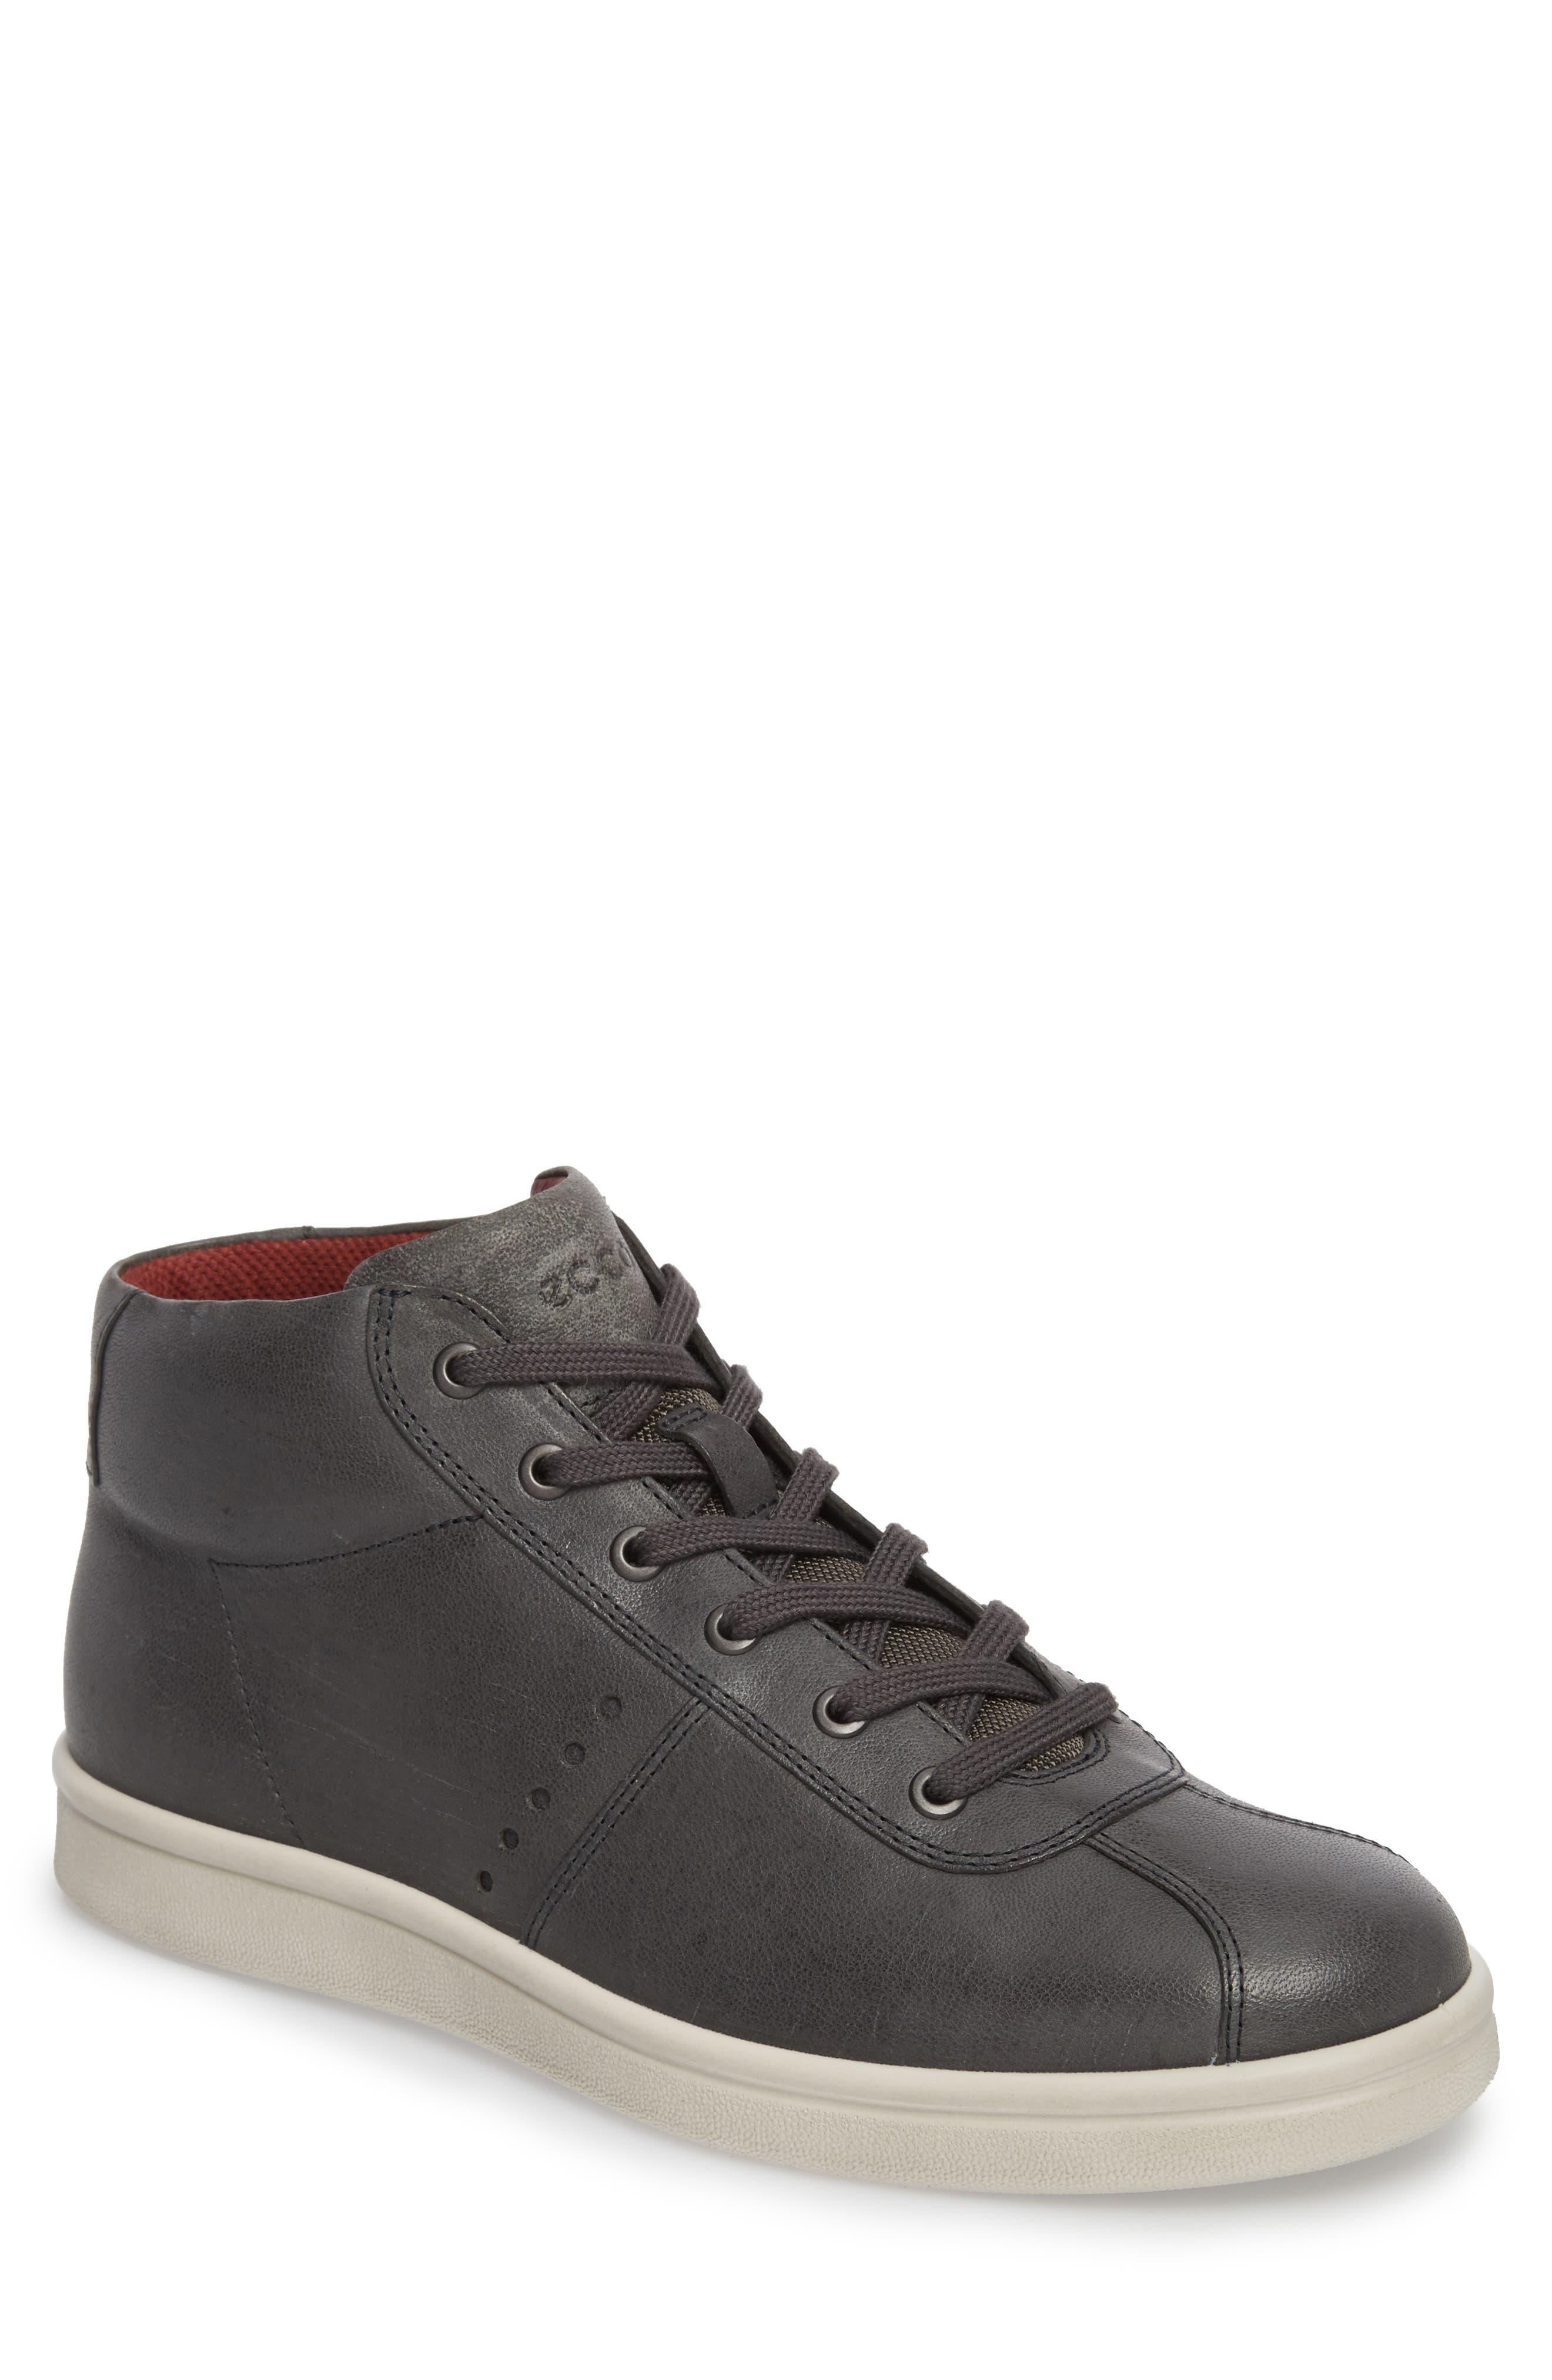 Kallum High Top Sneaker,                             Main thumbnail 1, color,                             Moonless Leather